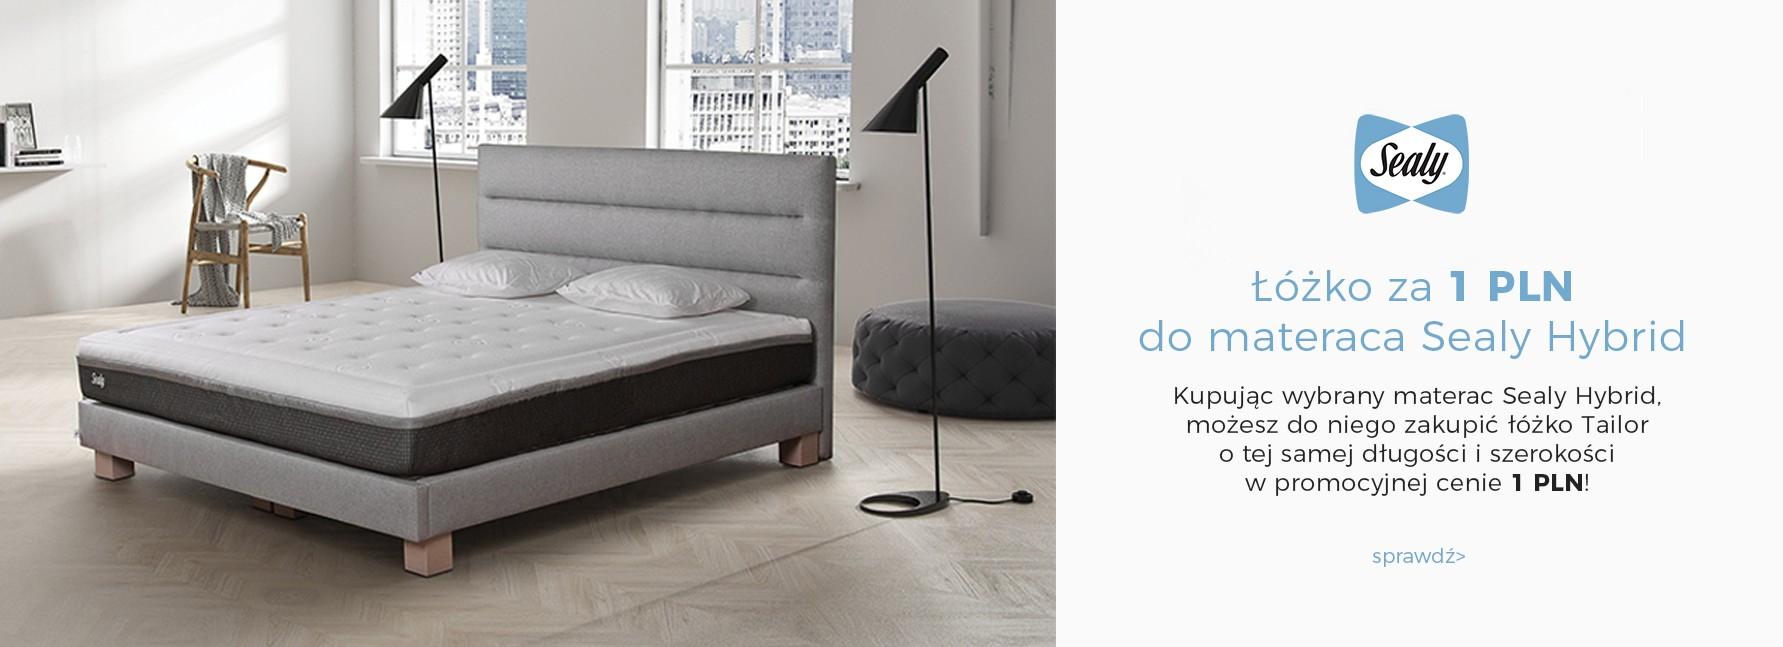 Łóżko Tailor za 1 PLN